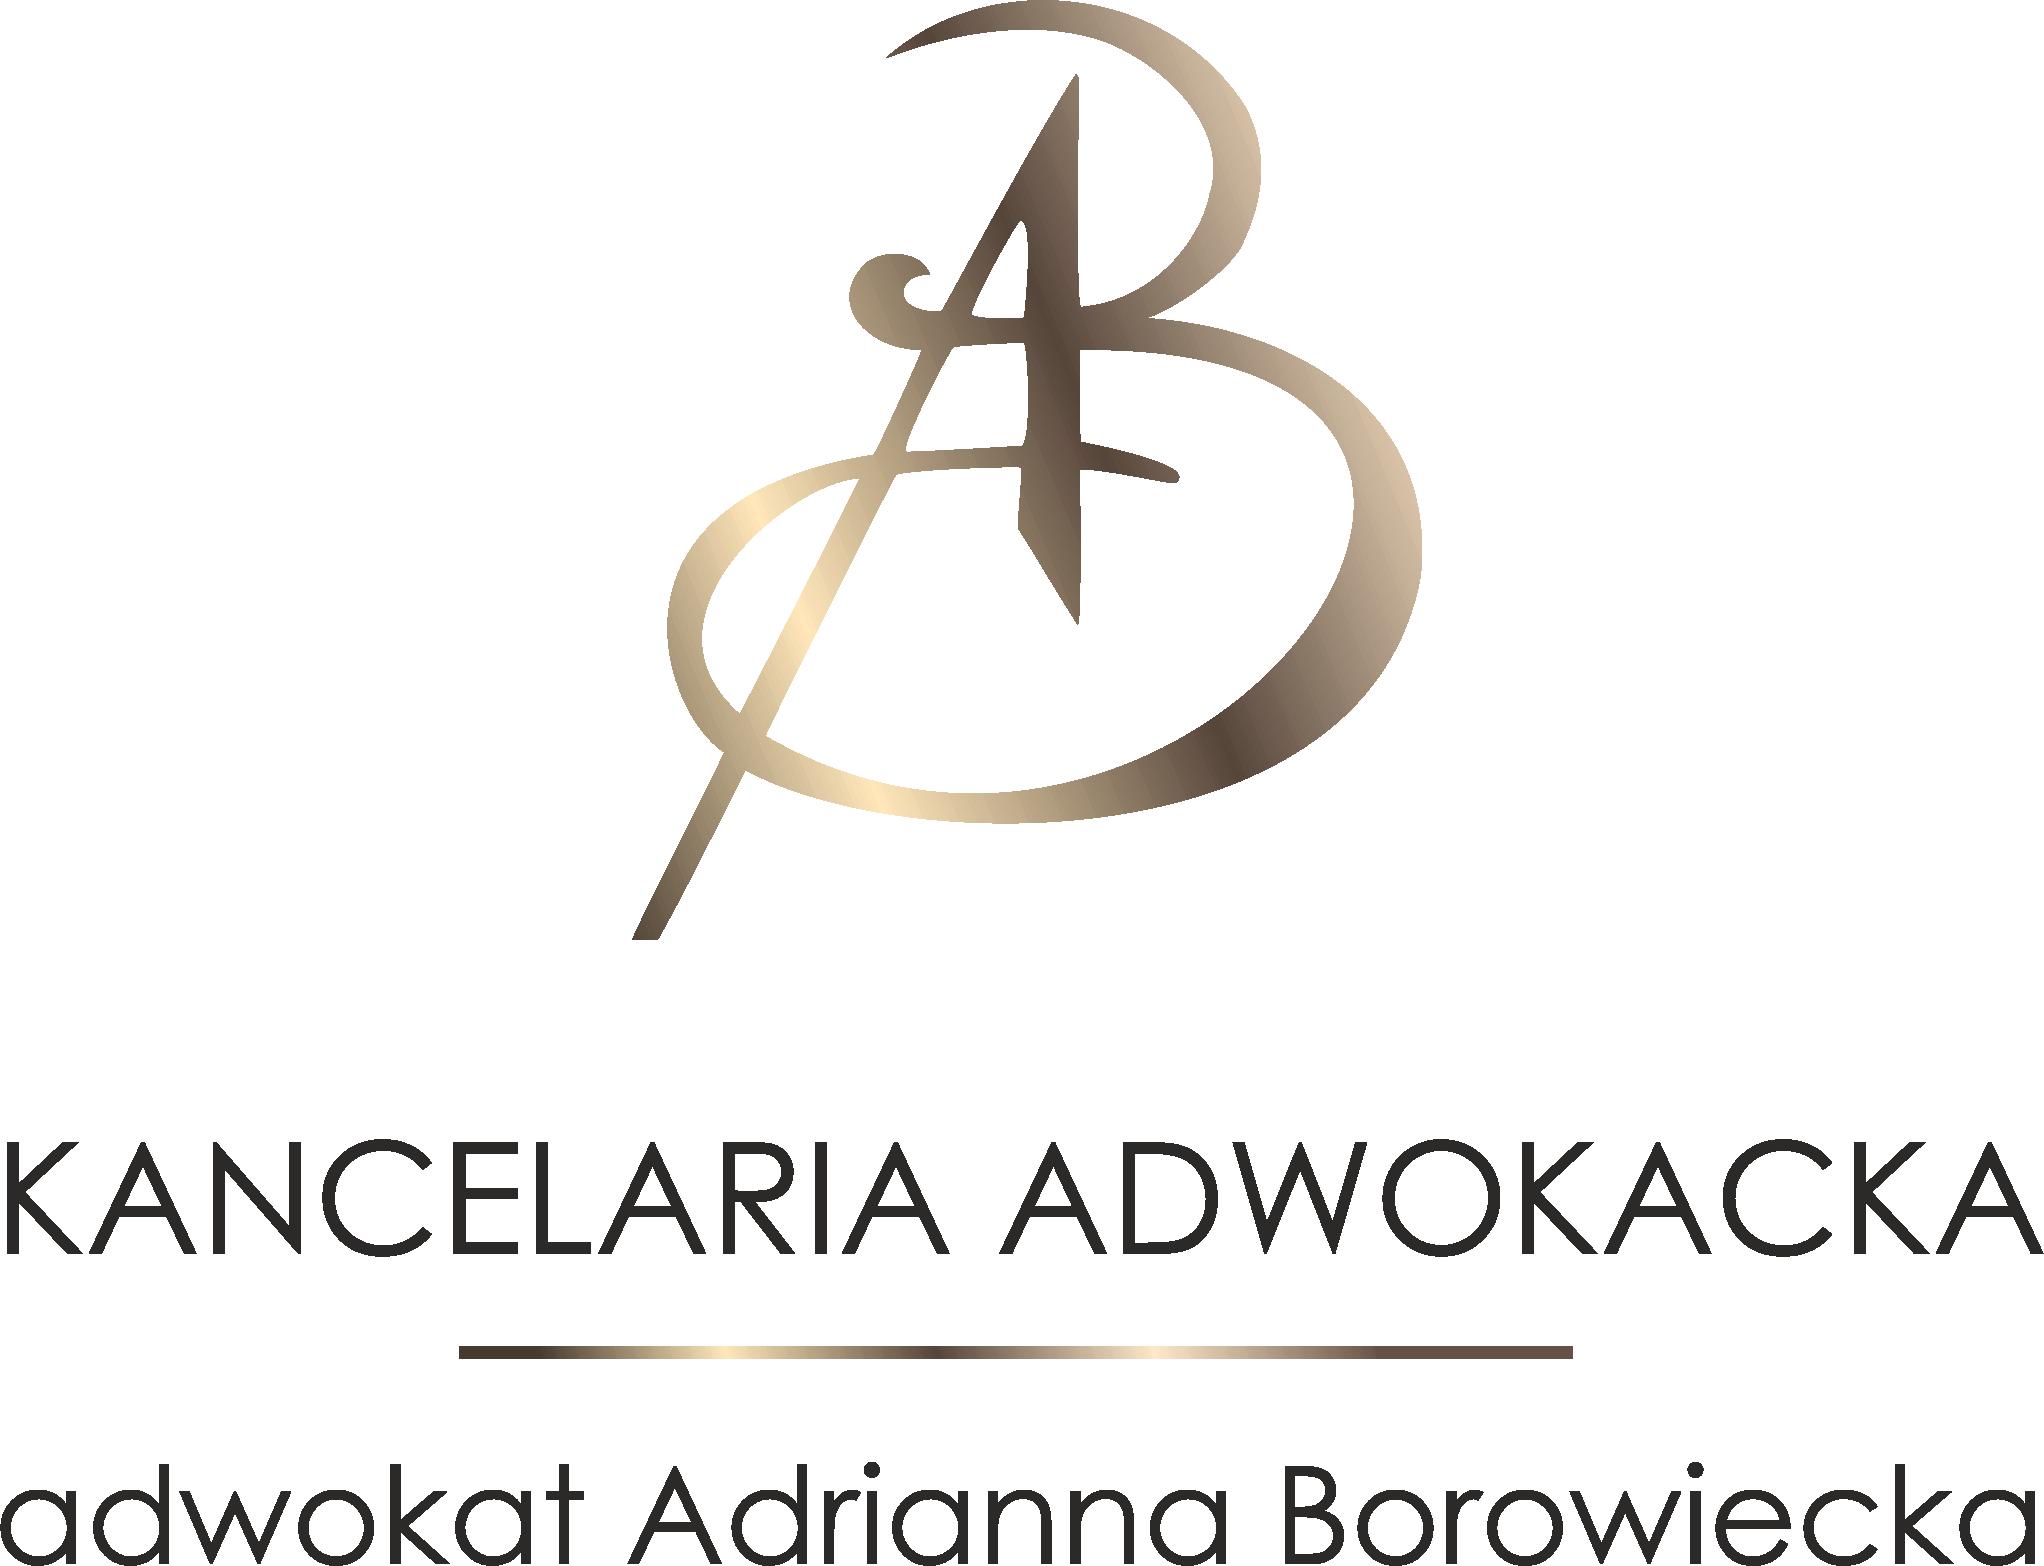 Adwokat Borowiecka logo